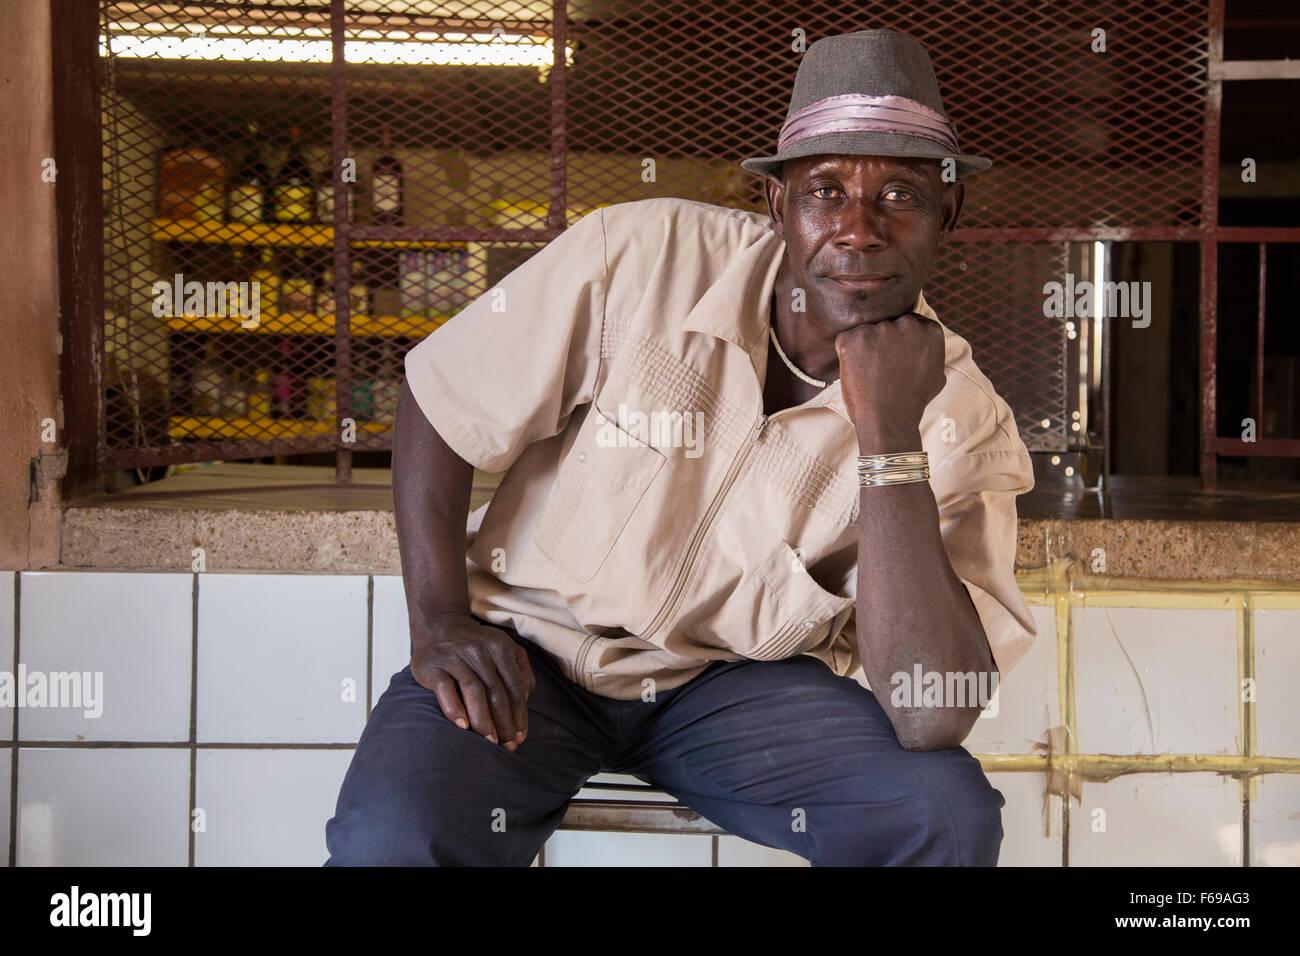 Namibian boxer at Tytanic bar, Fort Sesfontein, Africa - Stock Image